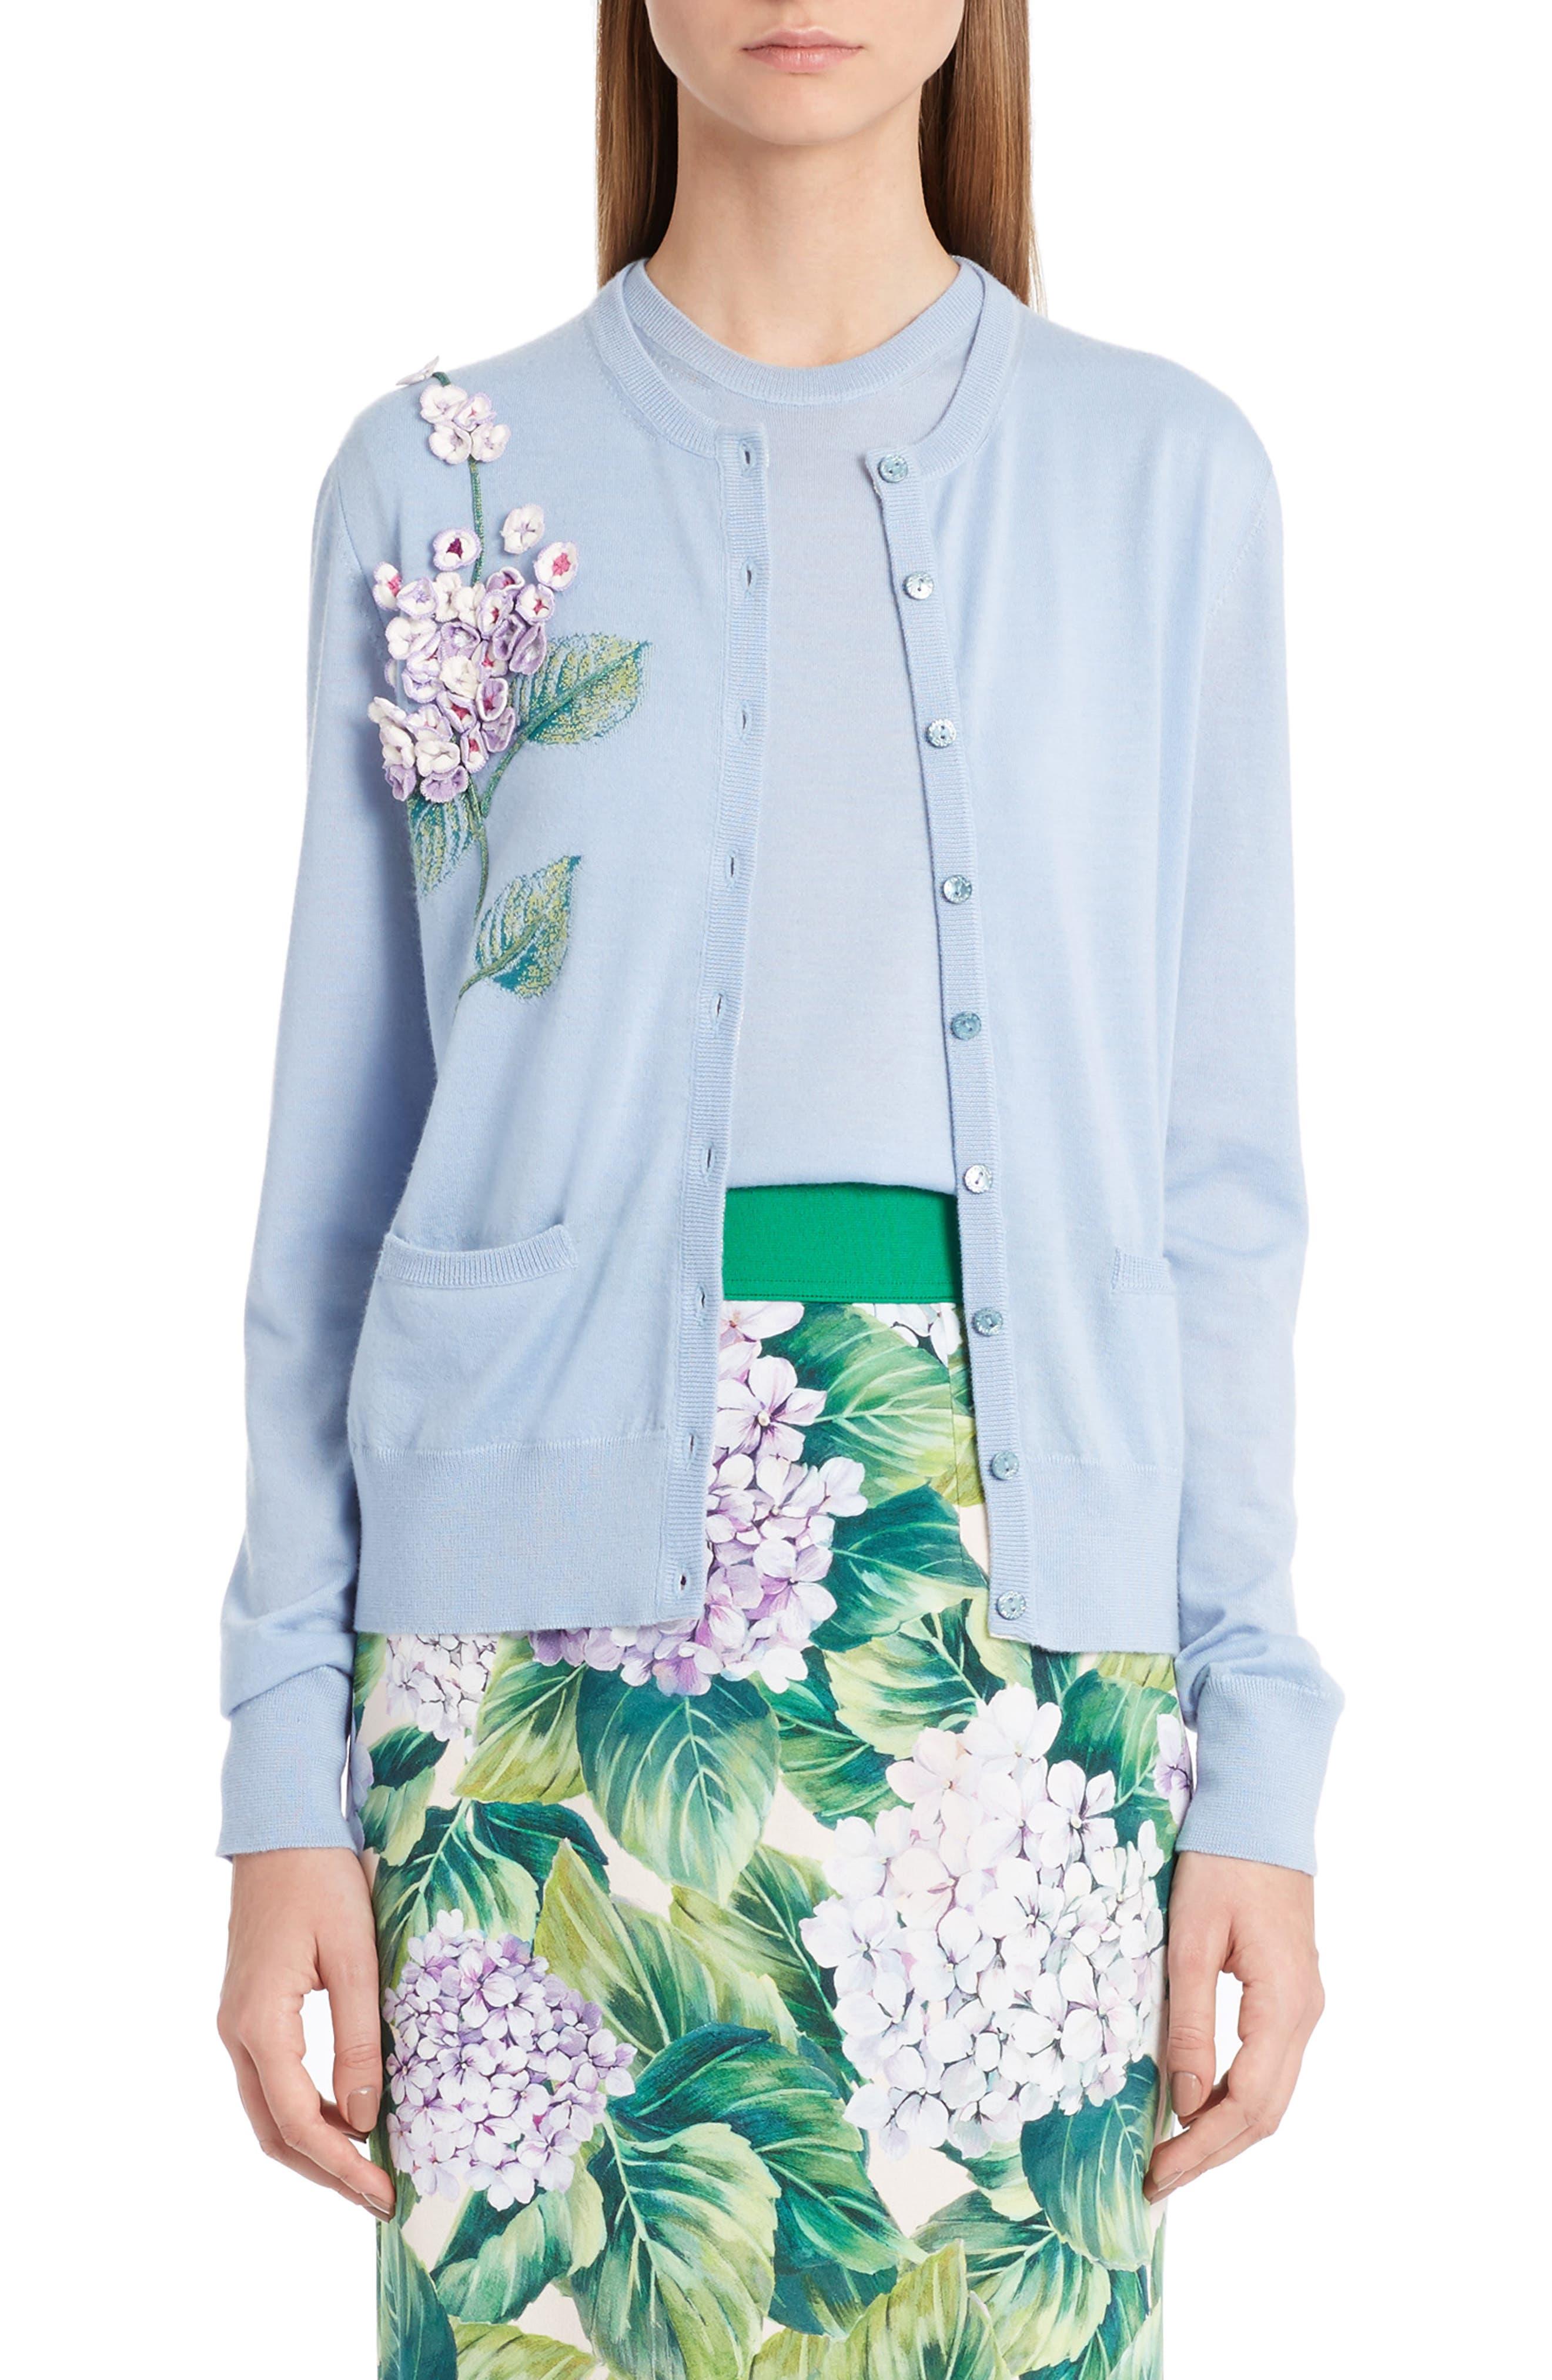 Dolce&Gabbana Embellished Cashmere & Silk Button Cardigan